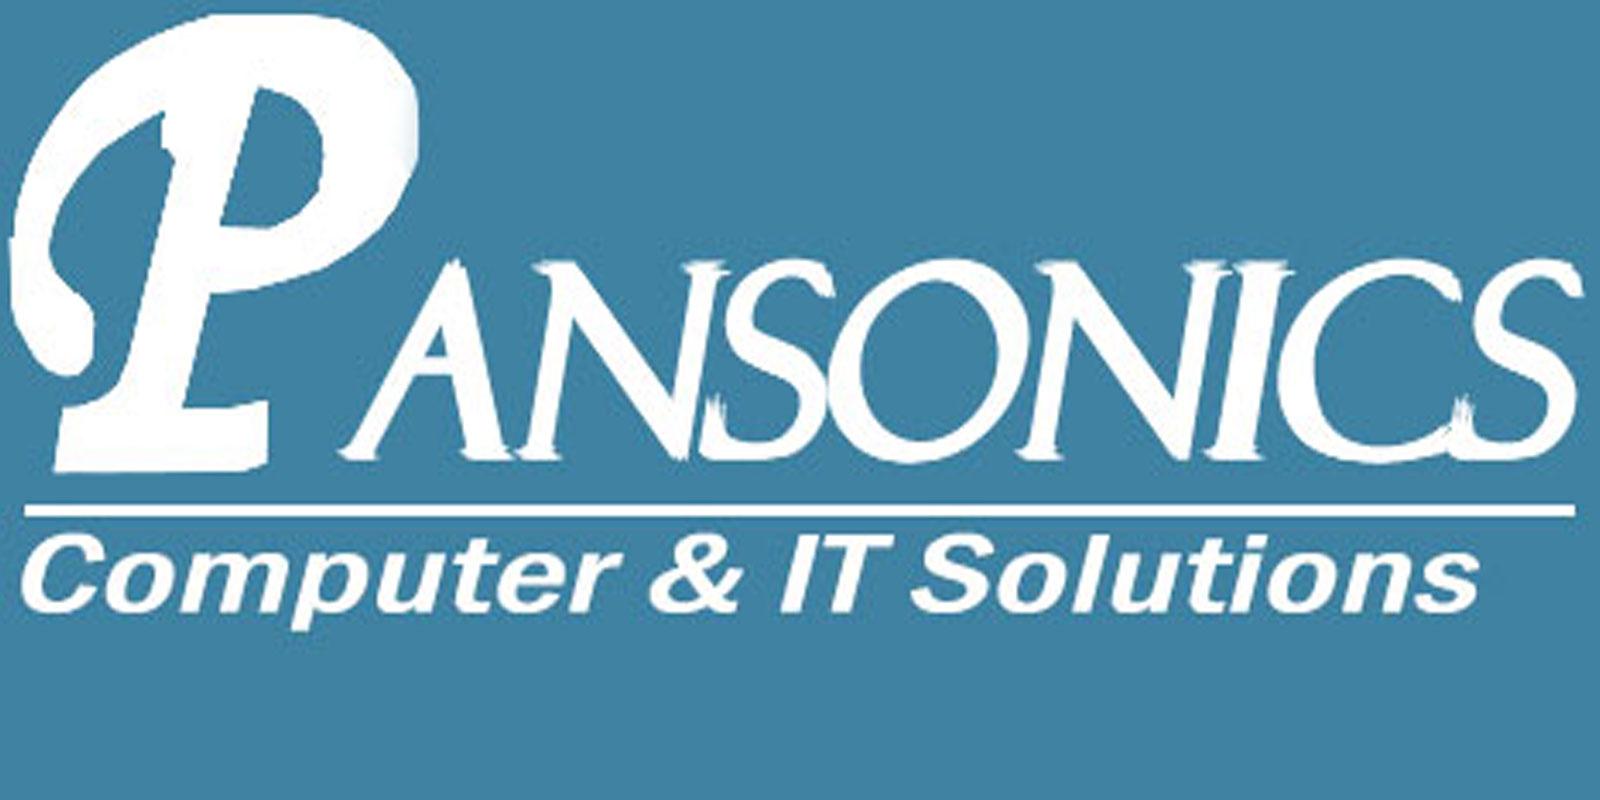 Pansonics Computer Co., Ltd.